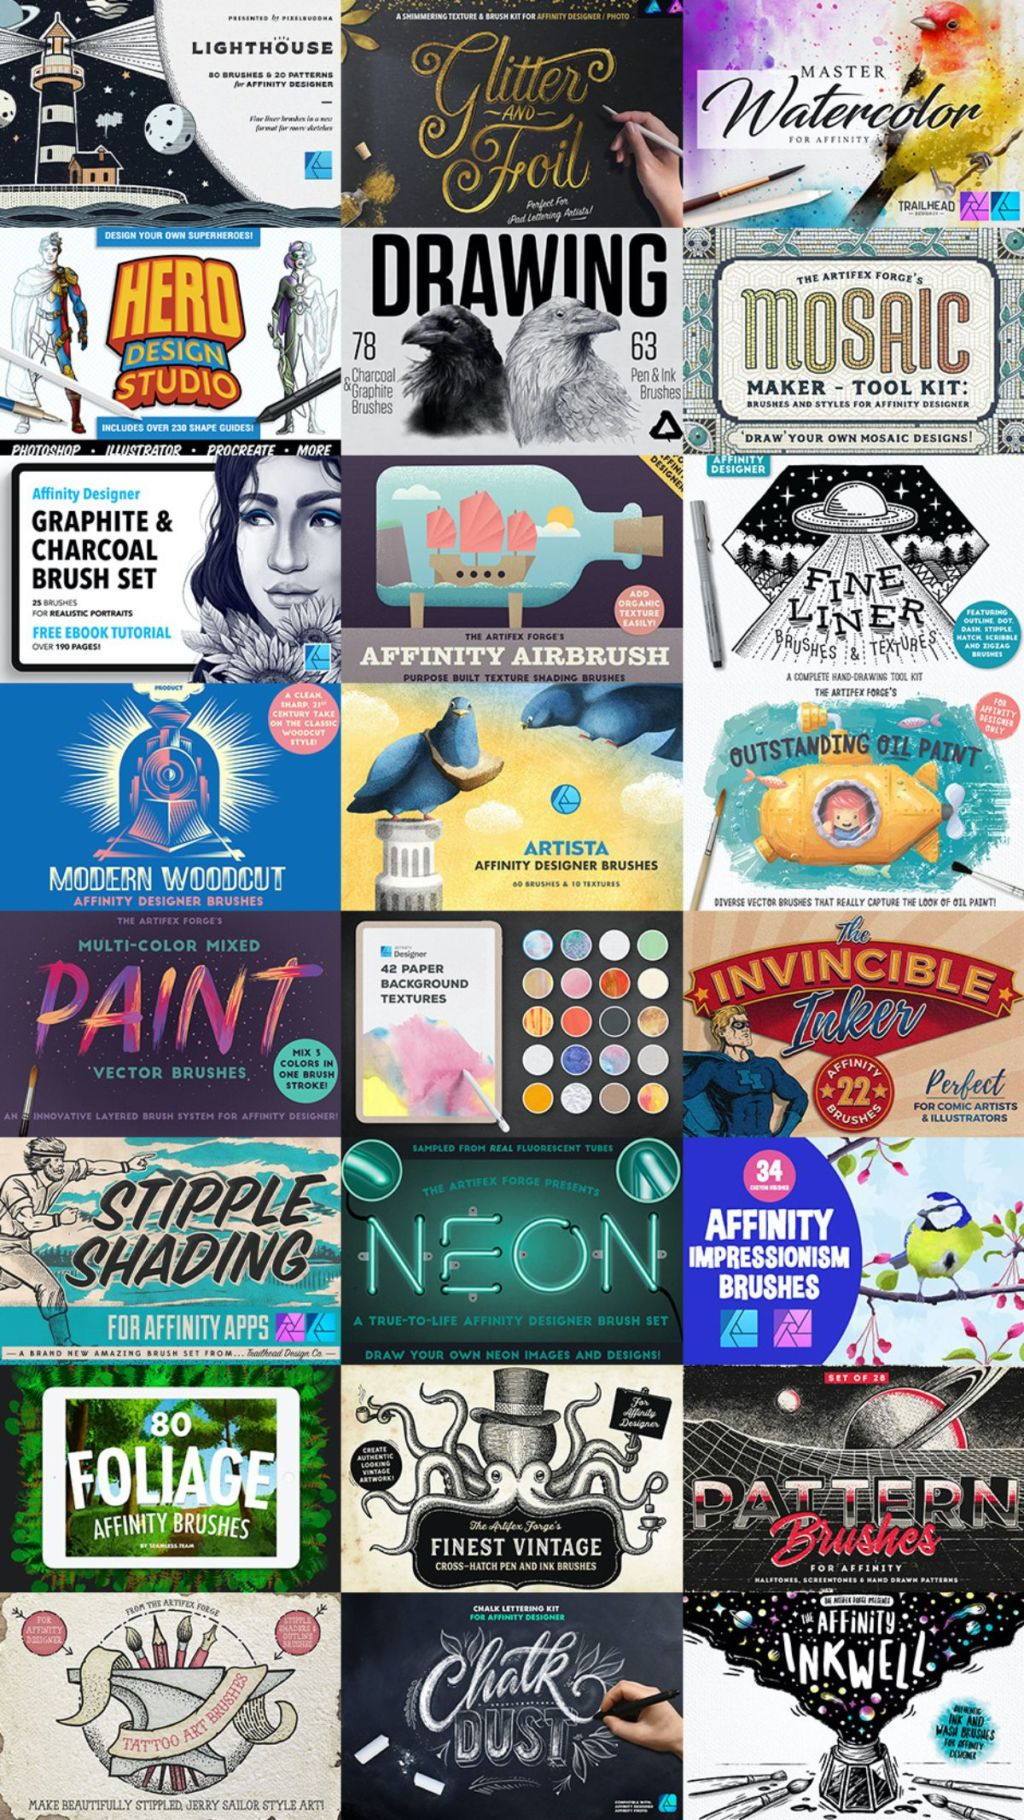 Affinity designer and photo brush sale list